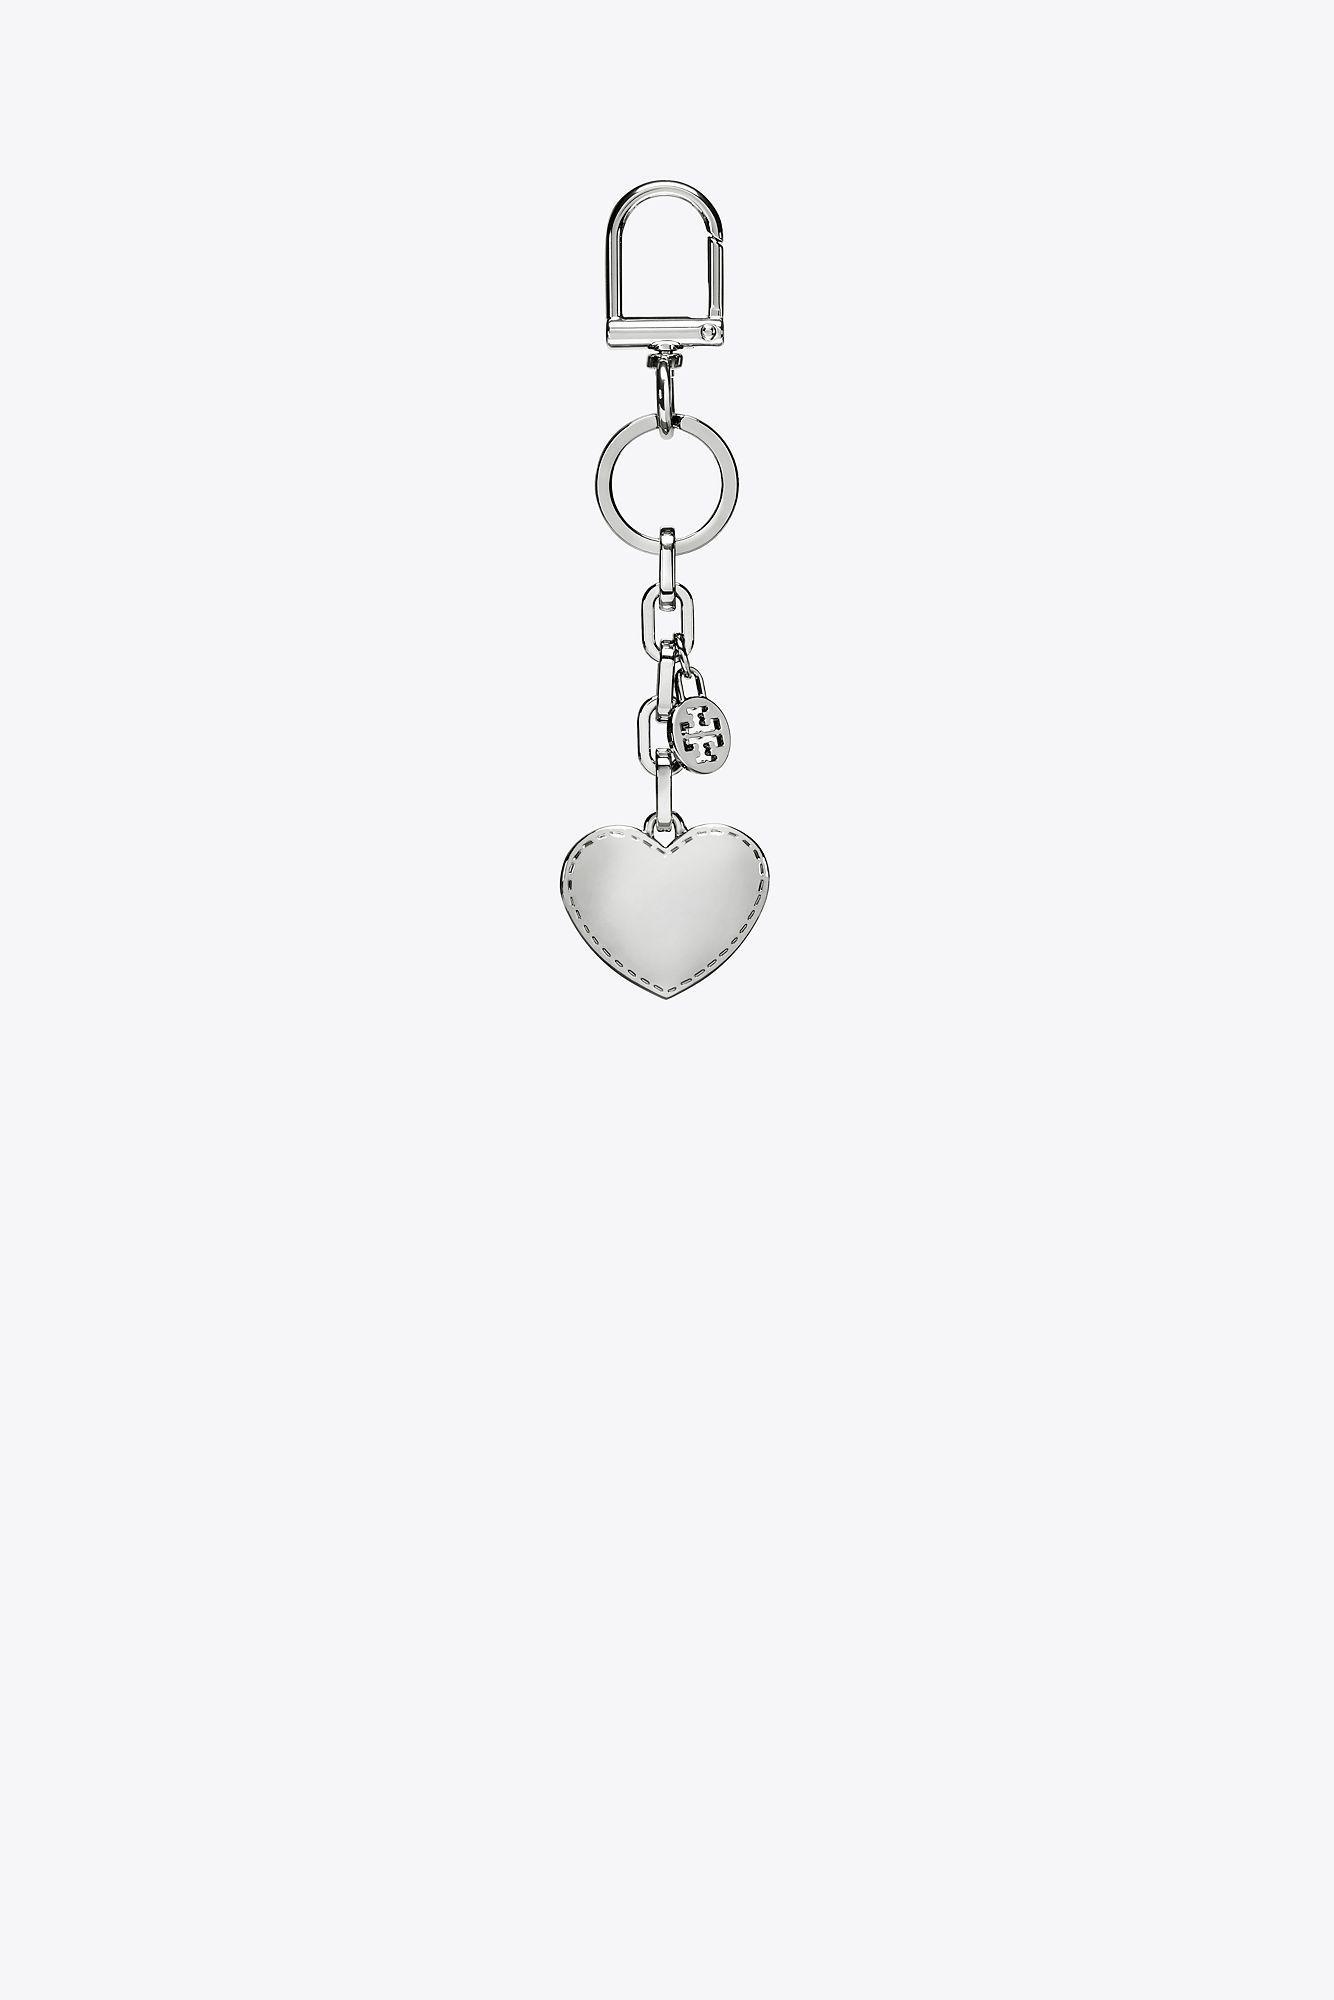 93c72e79b6f3 Tory Burch Logo And Heart Metal Key Fob in Metallic - Lyst